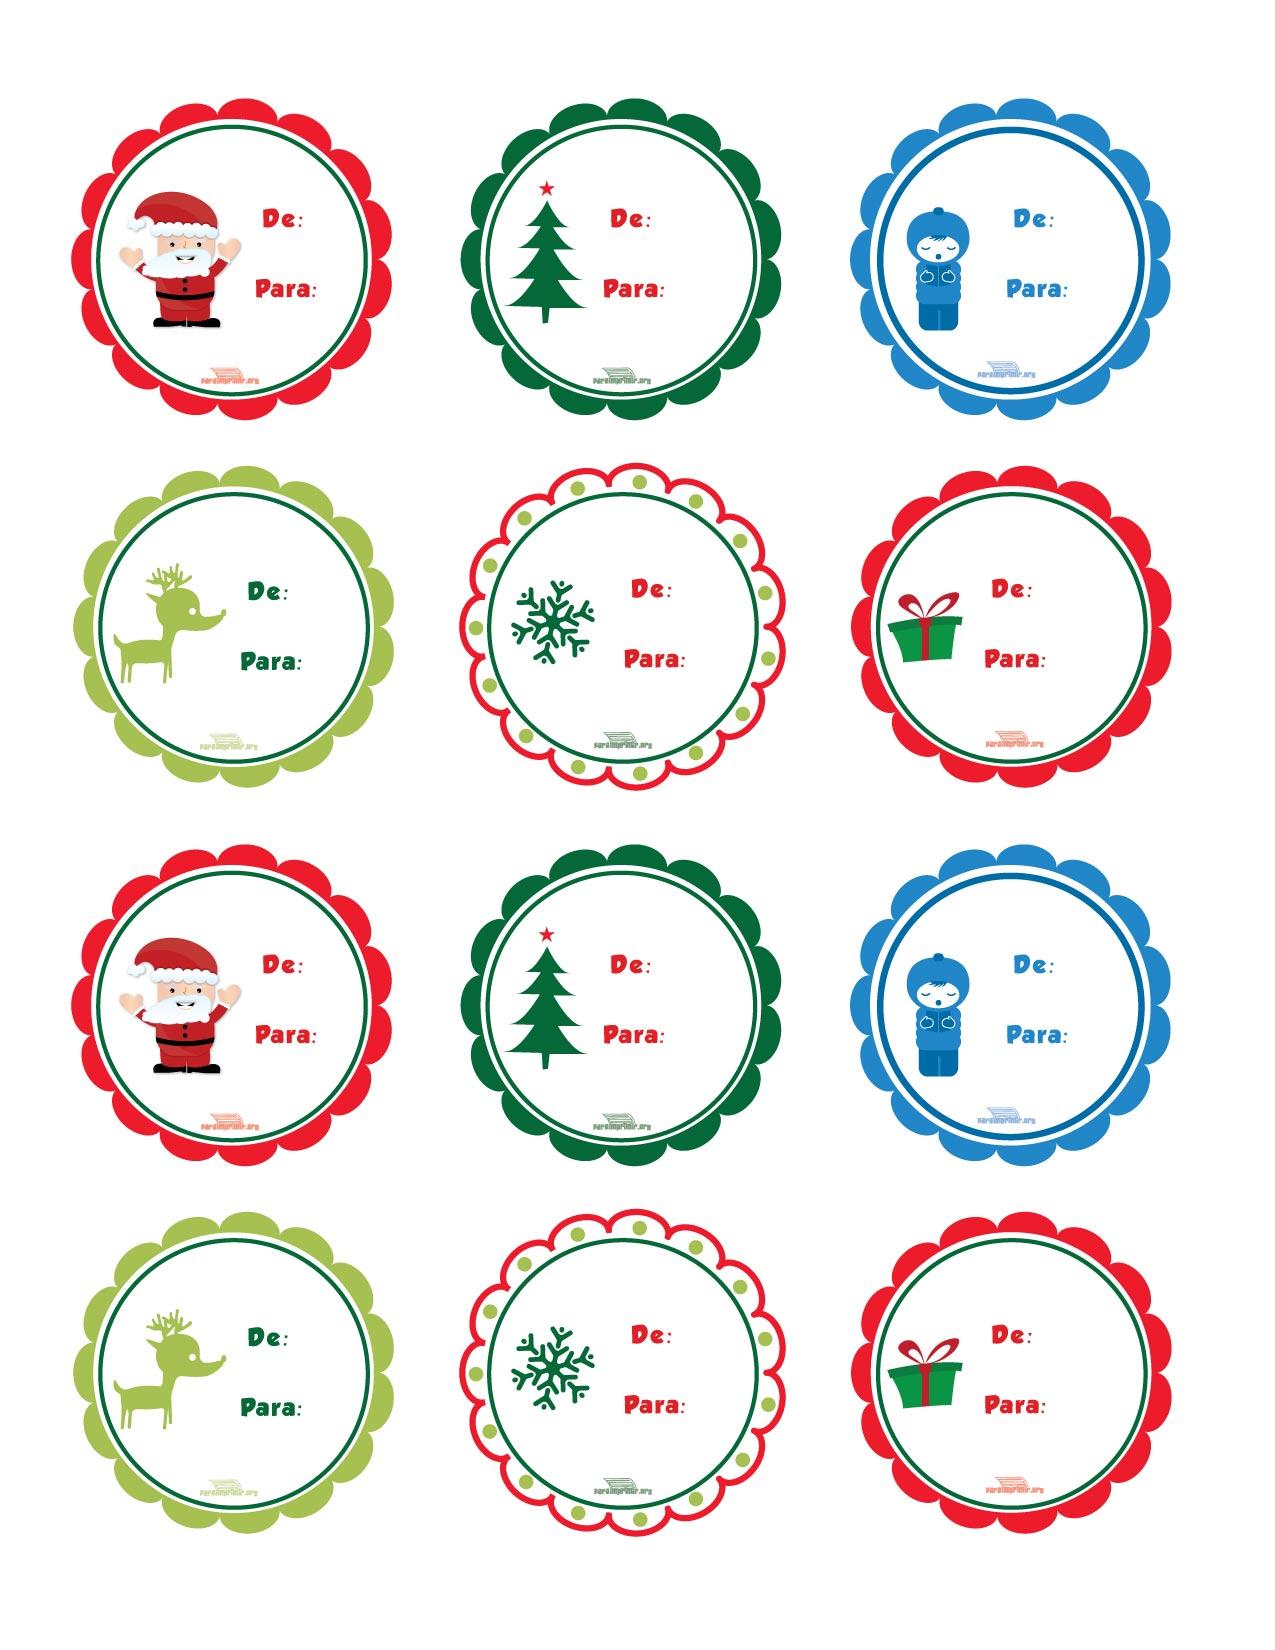 Imagenes De Motivos Navidenos Para Imprimir.Etiquetas Navidenas Para Imprimir